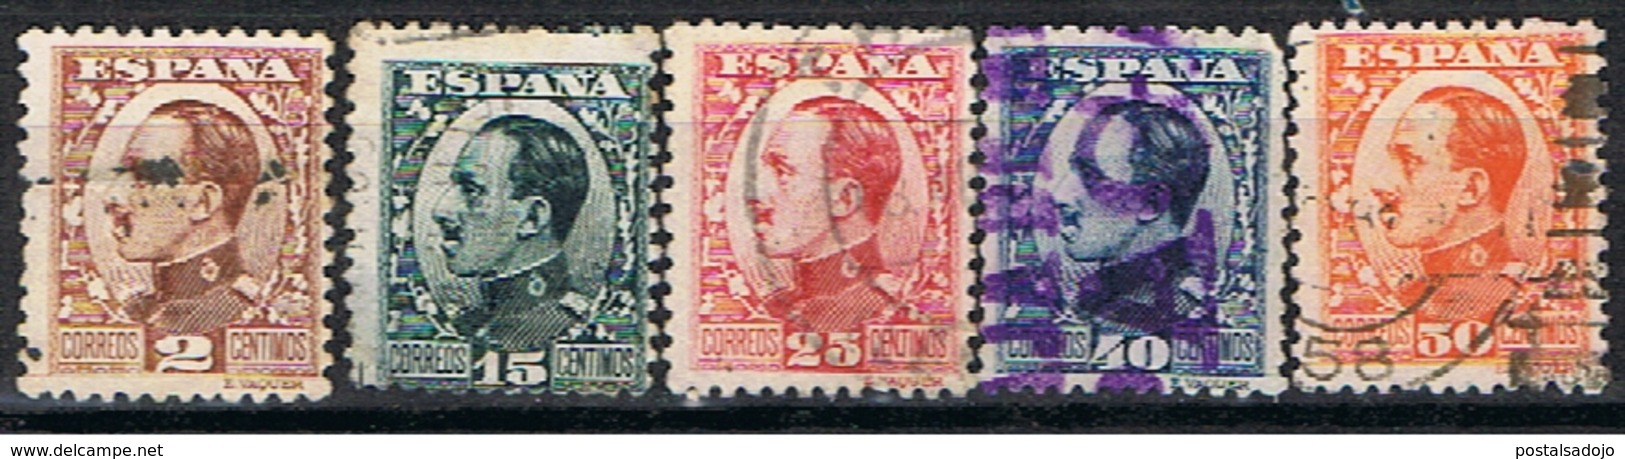 (E 675) ESPAÑA //  EDIFIL 490, 493, 495, 497, 498 //  1930-31 - 1889-1931 Royaume: Alphonse XIII